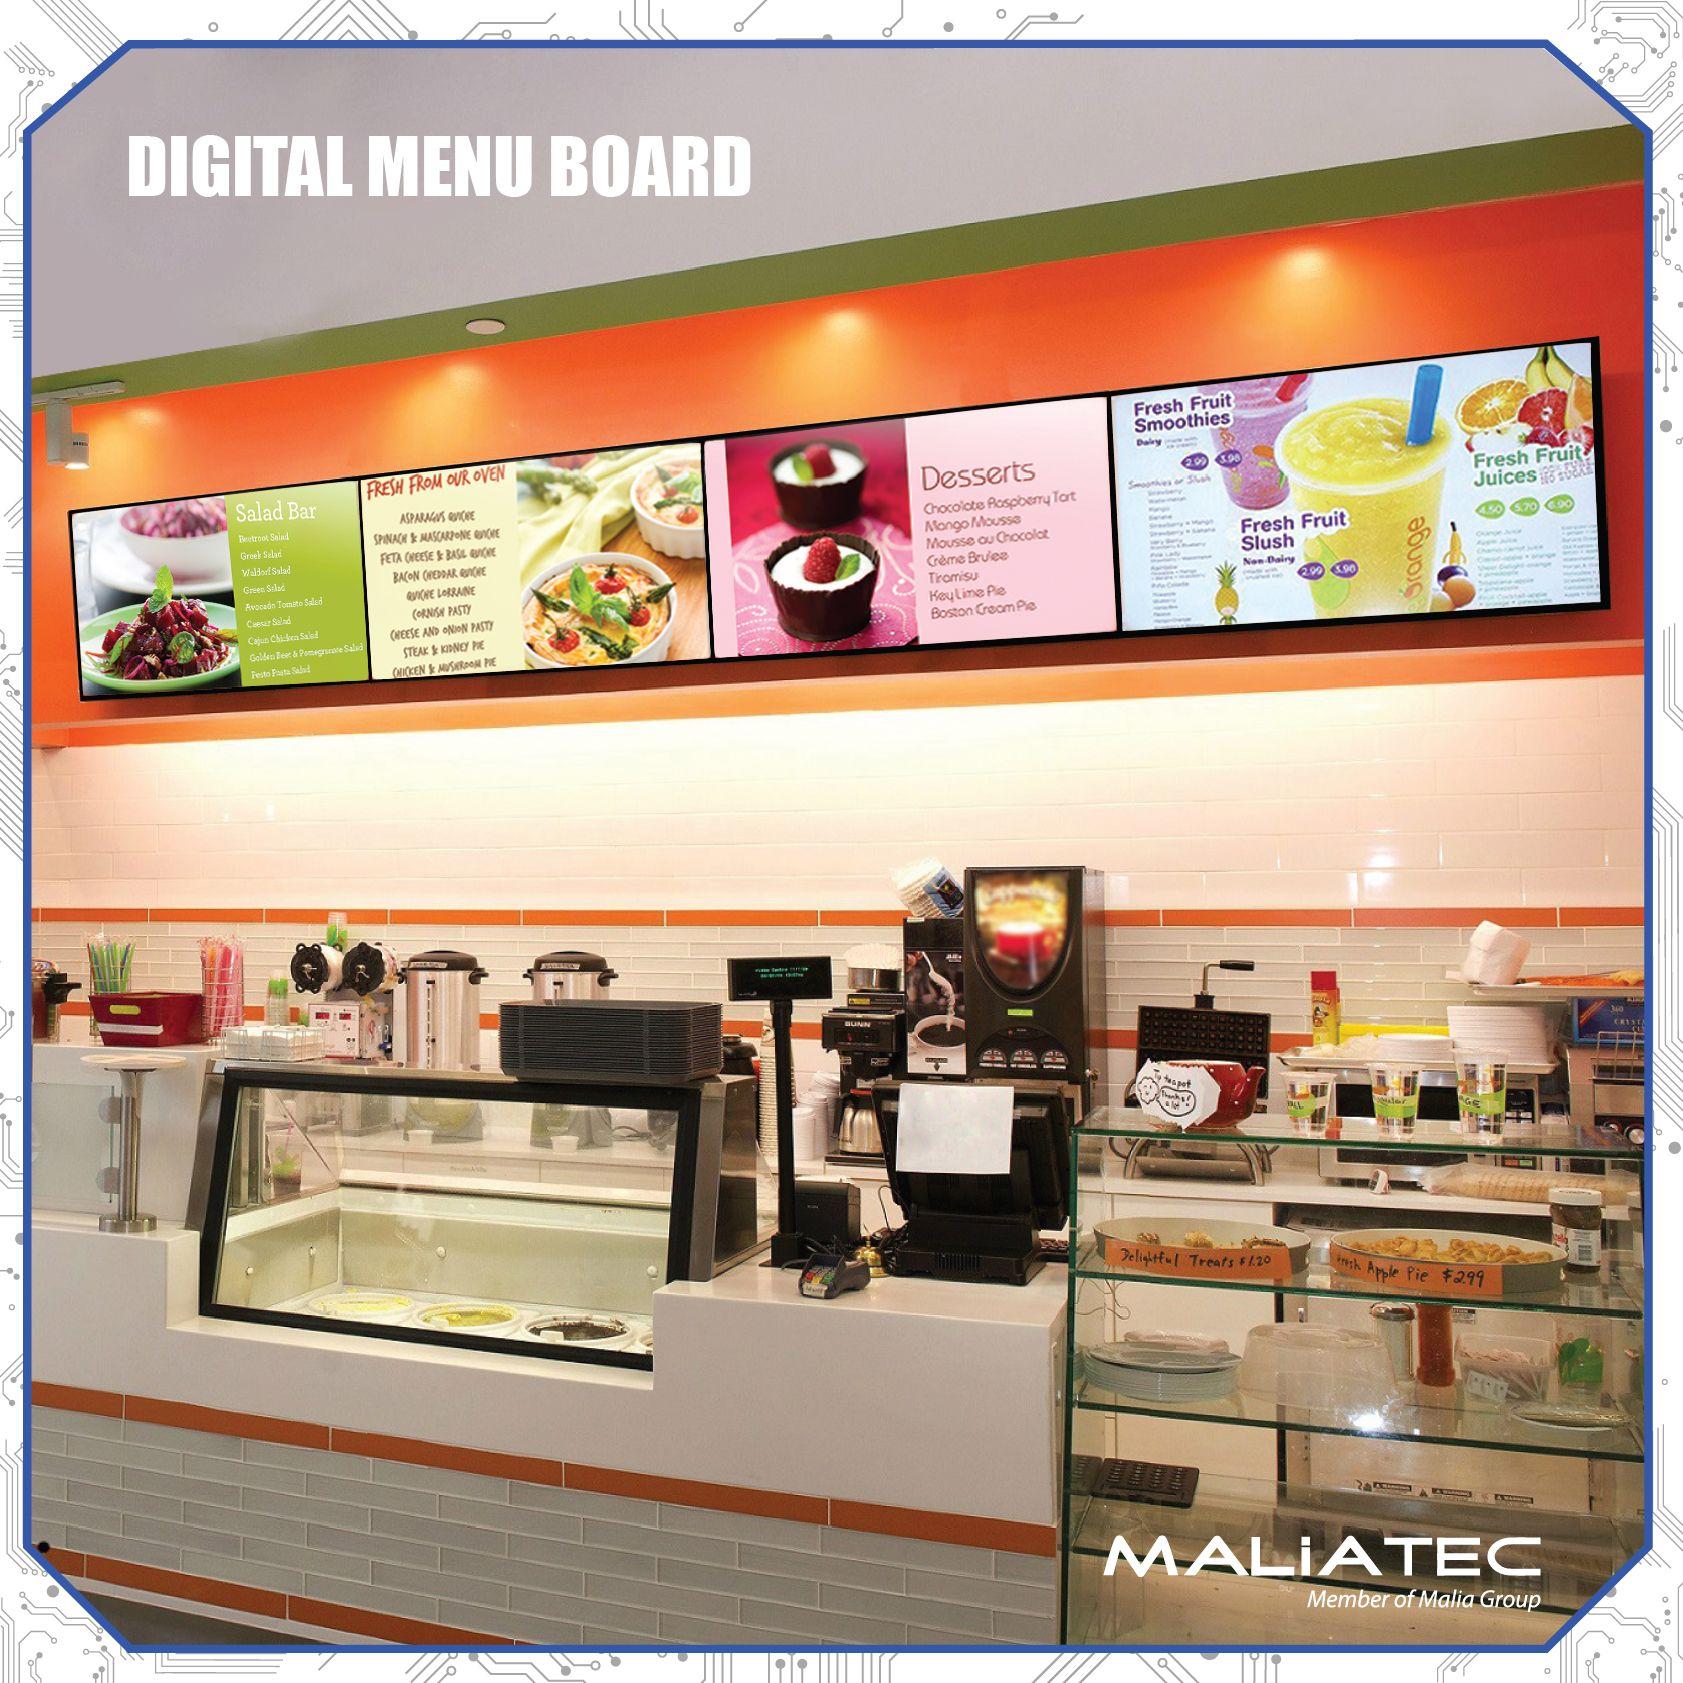 Digital Menu Board Digitalsupport Maliatec Com Digital Menu